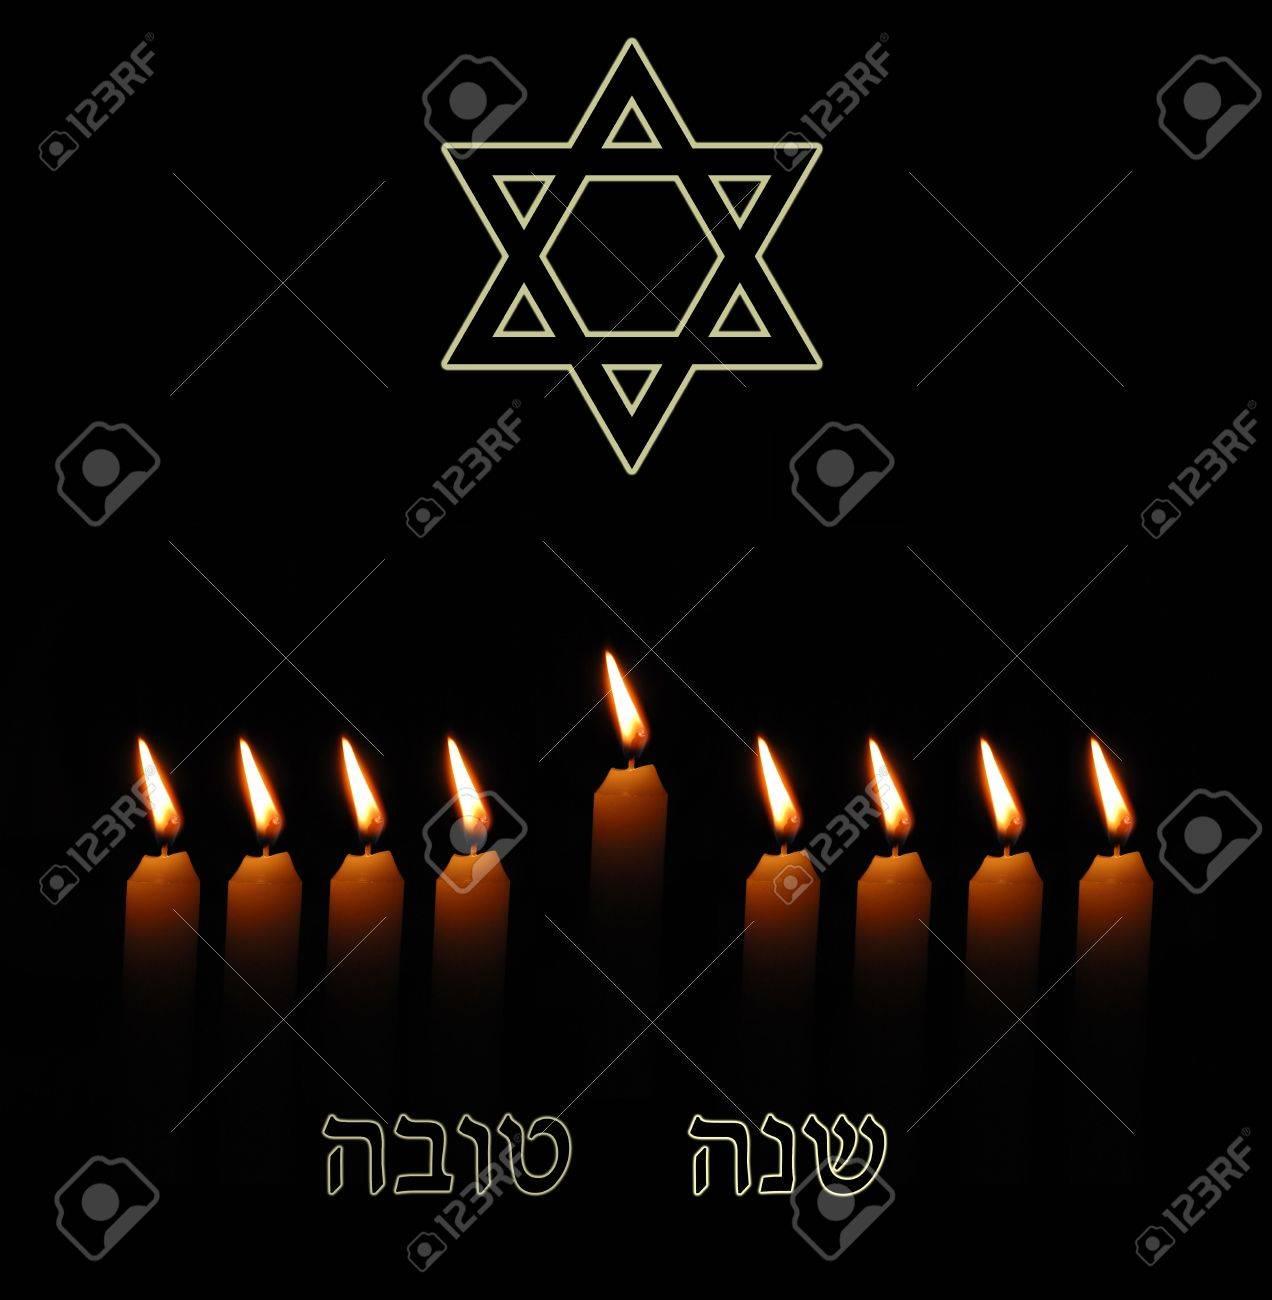 Jewish holiday background with David star,candles and Shana Tova greeting Stock Photo - 5549139